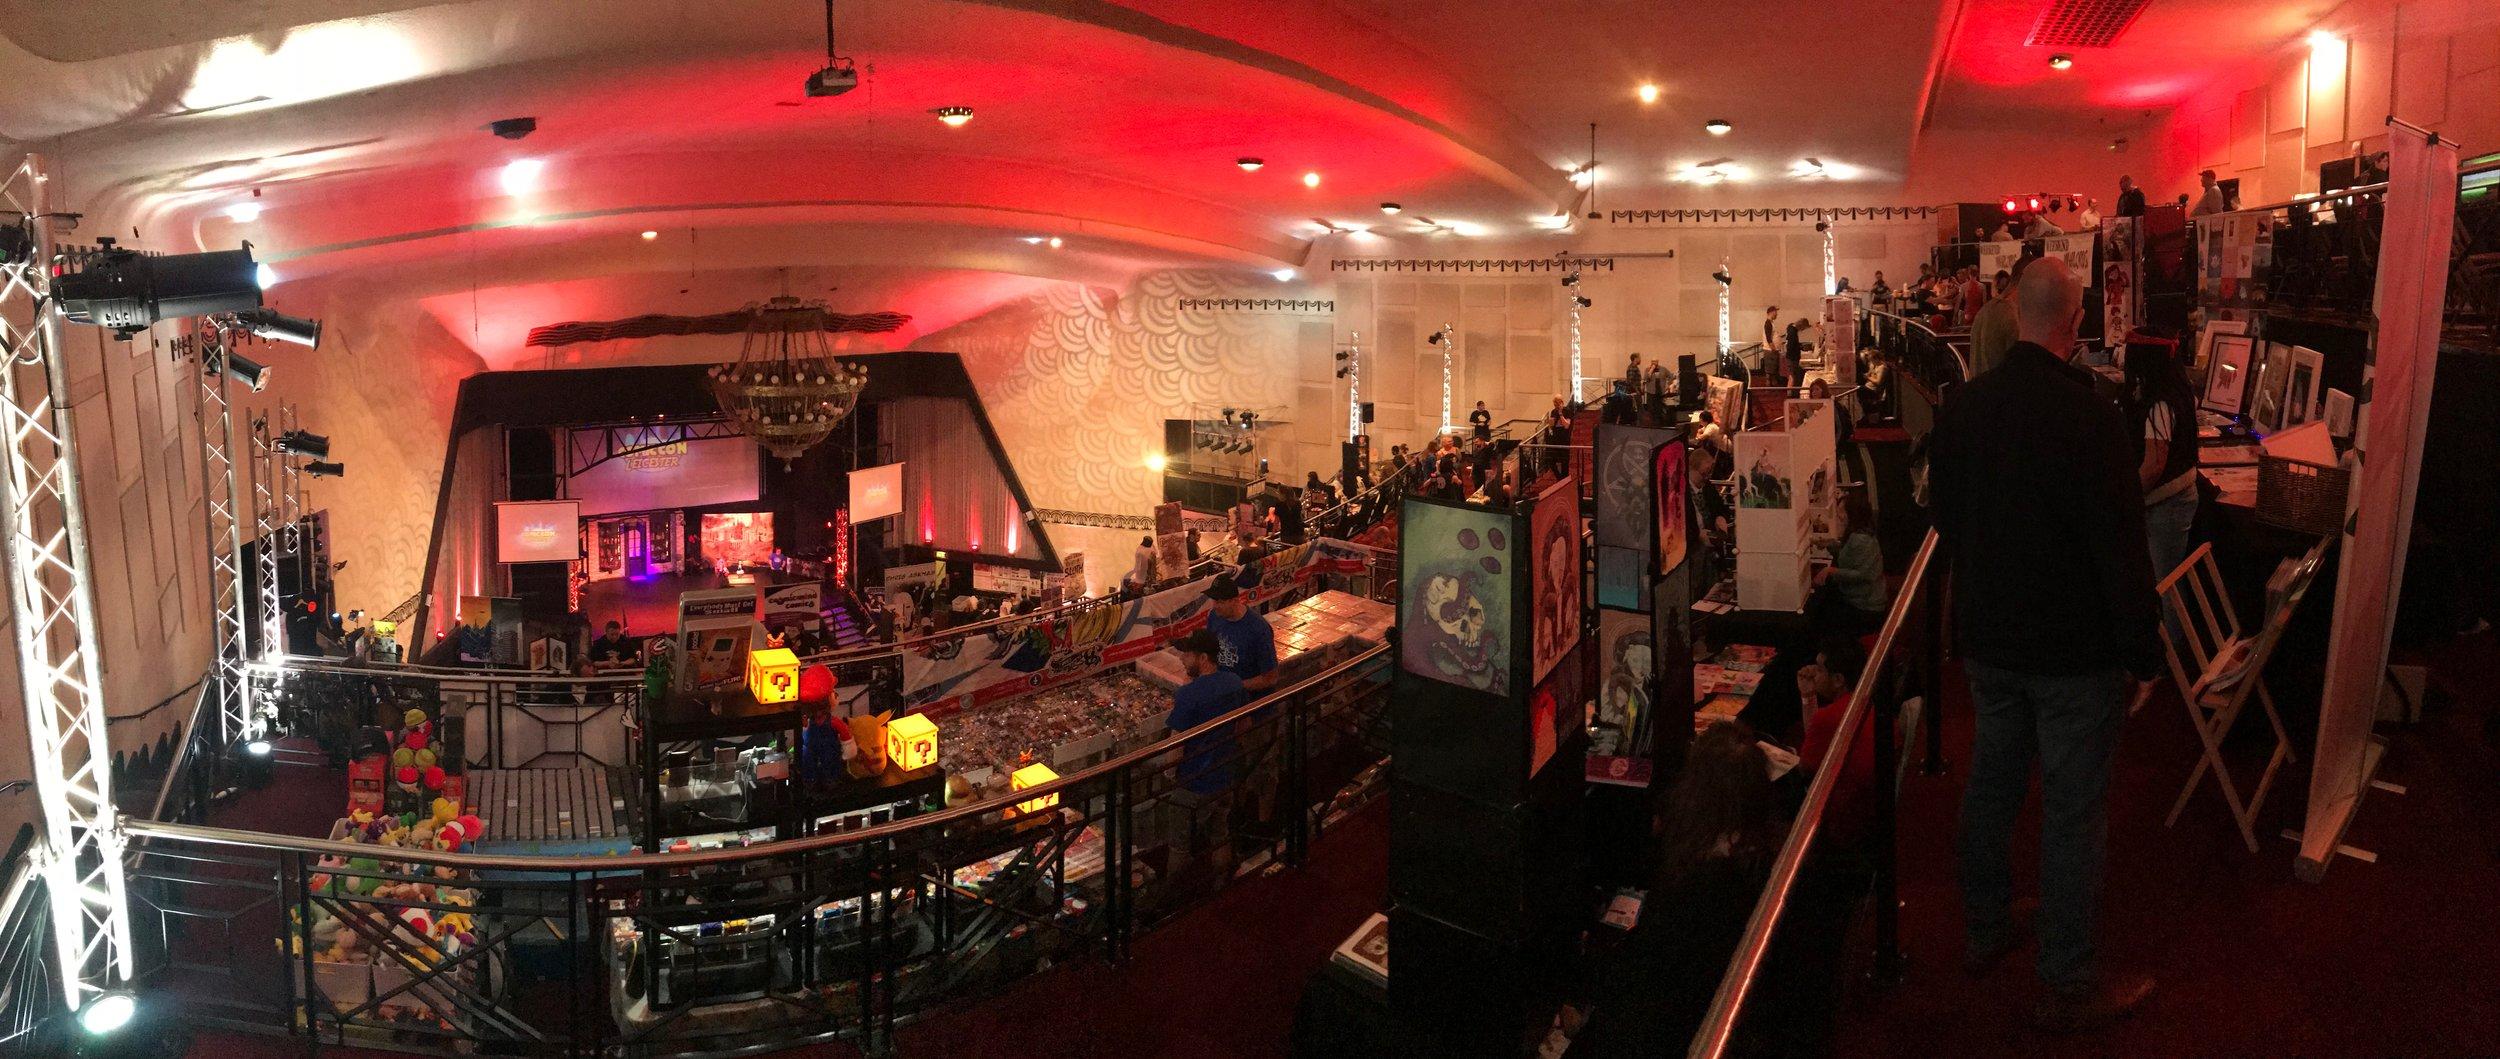 Leicester Comic Con Venue, The Athena